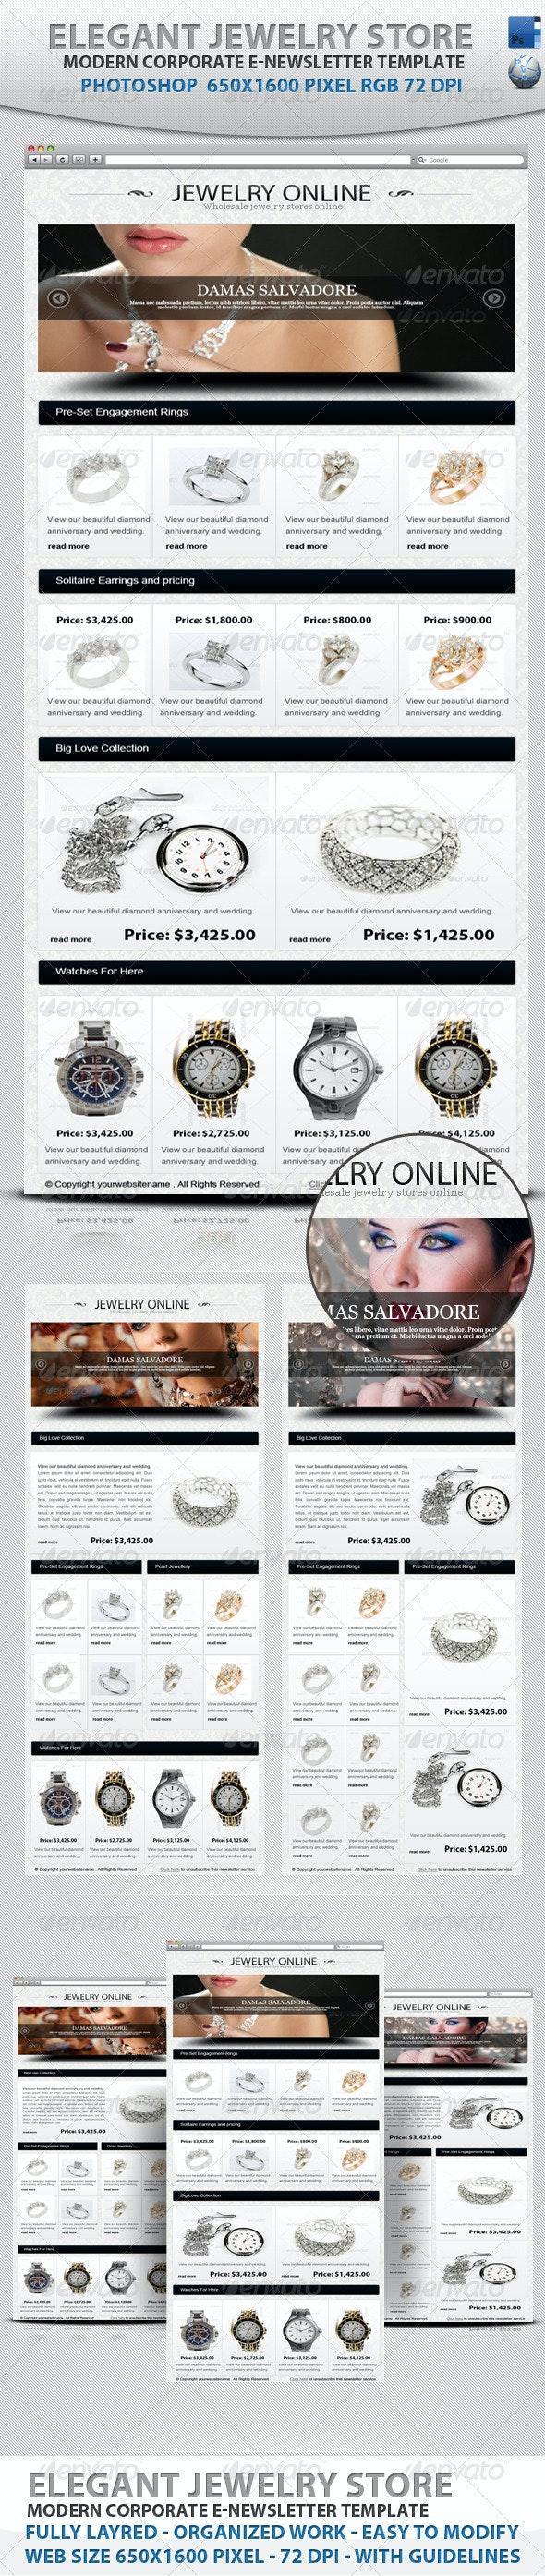 Elegant Jewelry Store E-newsletter